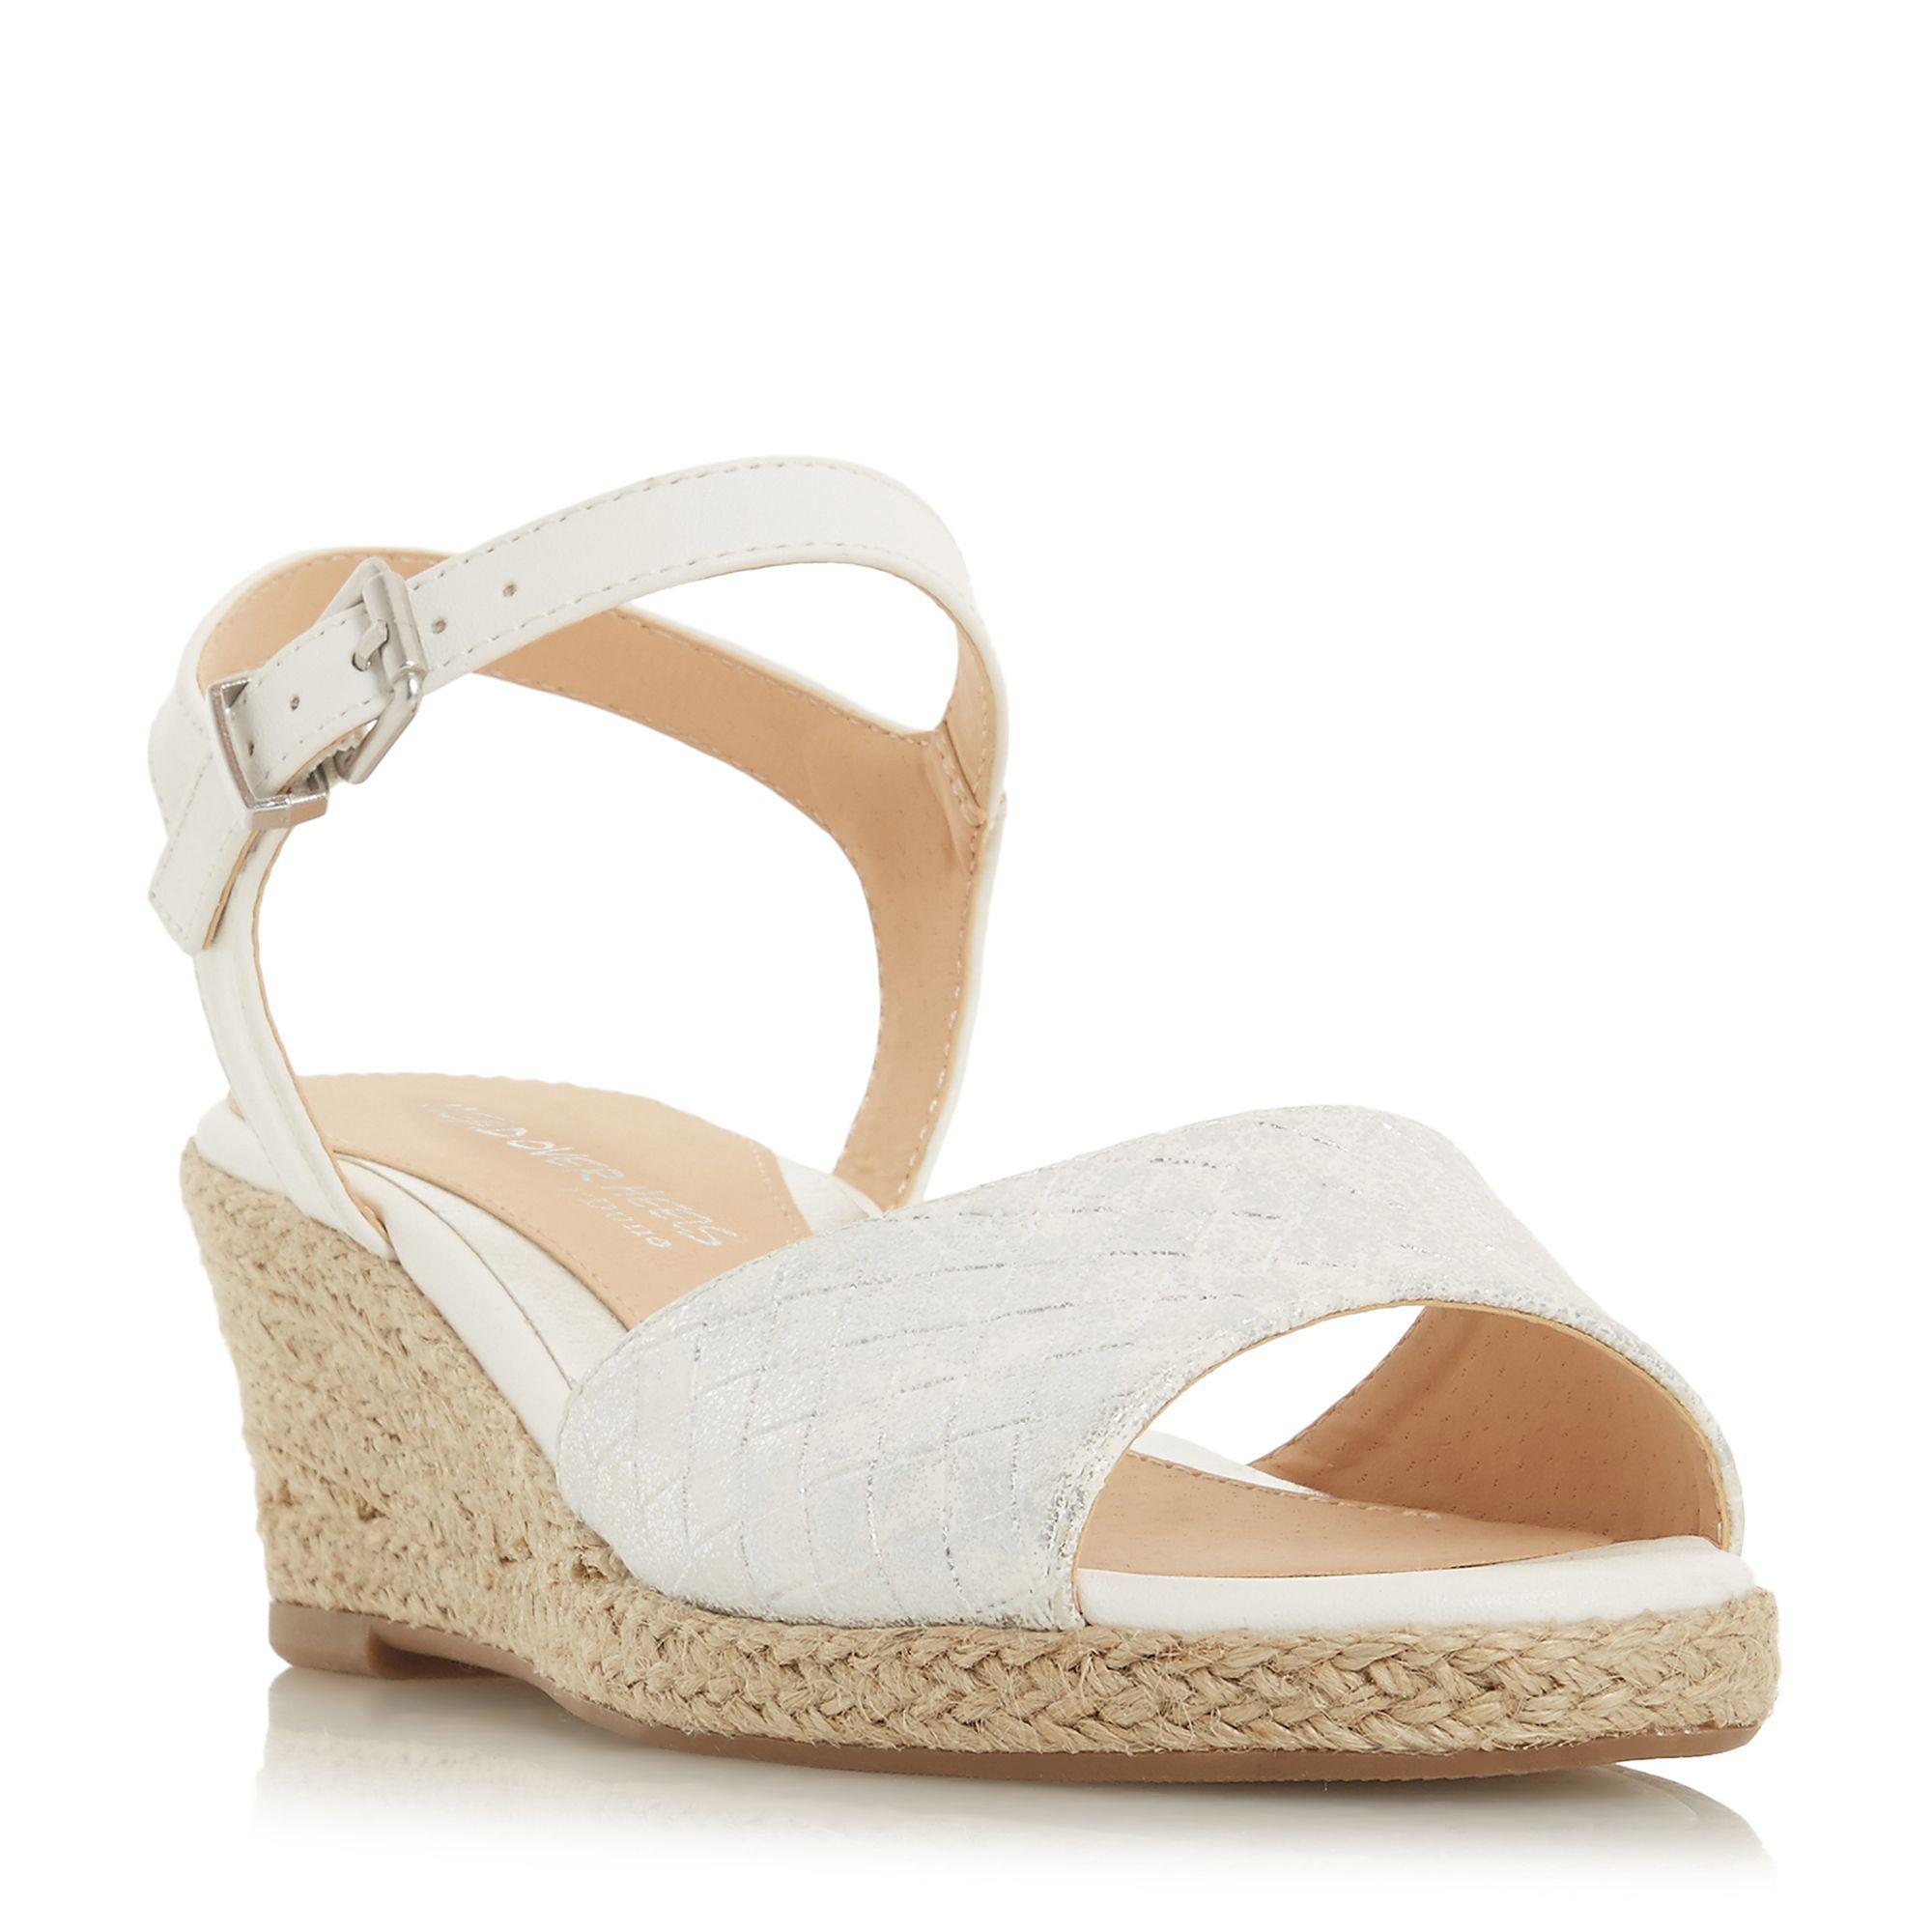 Navy leather 'Kestrel' mid wedge heel espadrilles release dates for sale reliable cheap online mKhCVupi